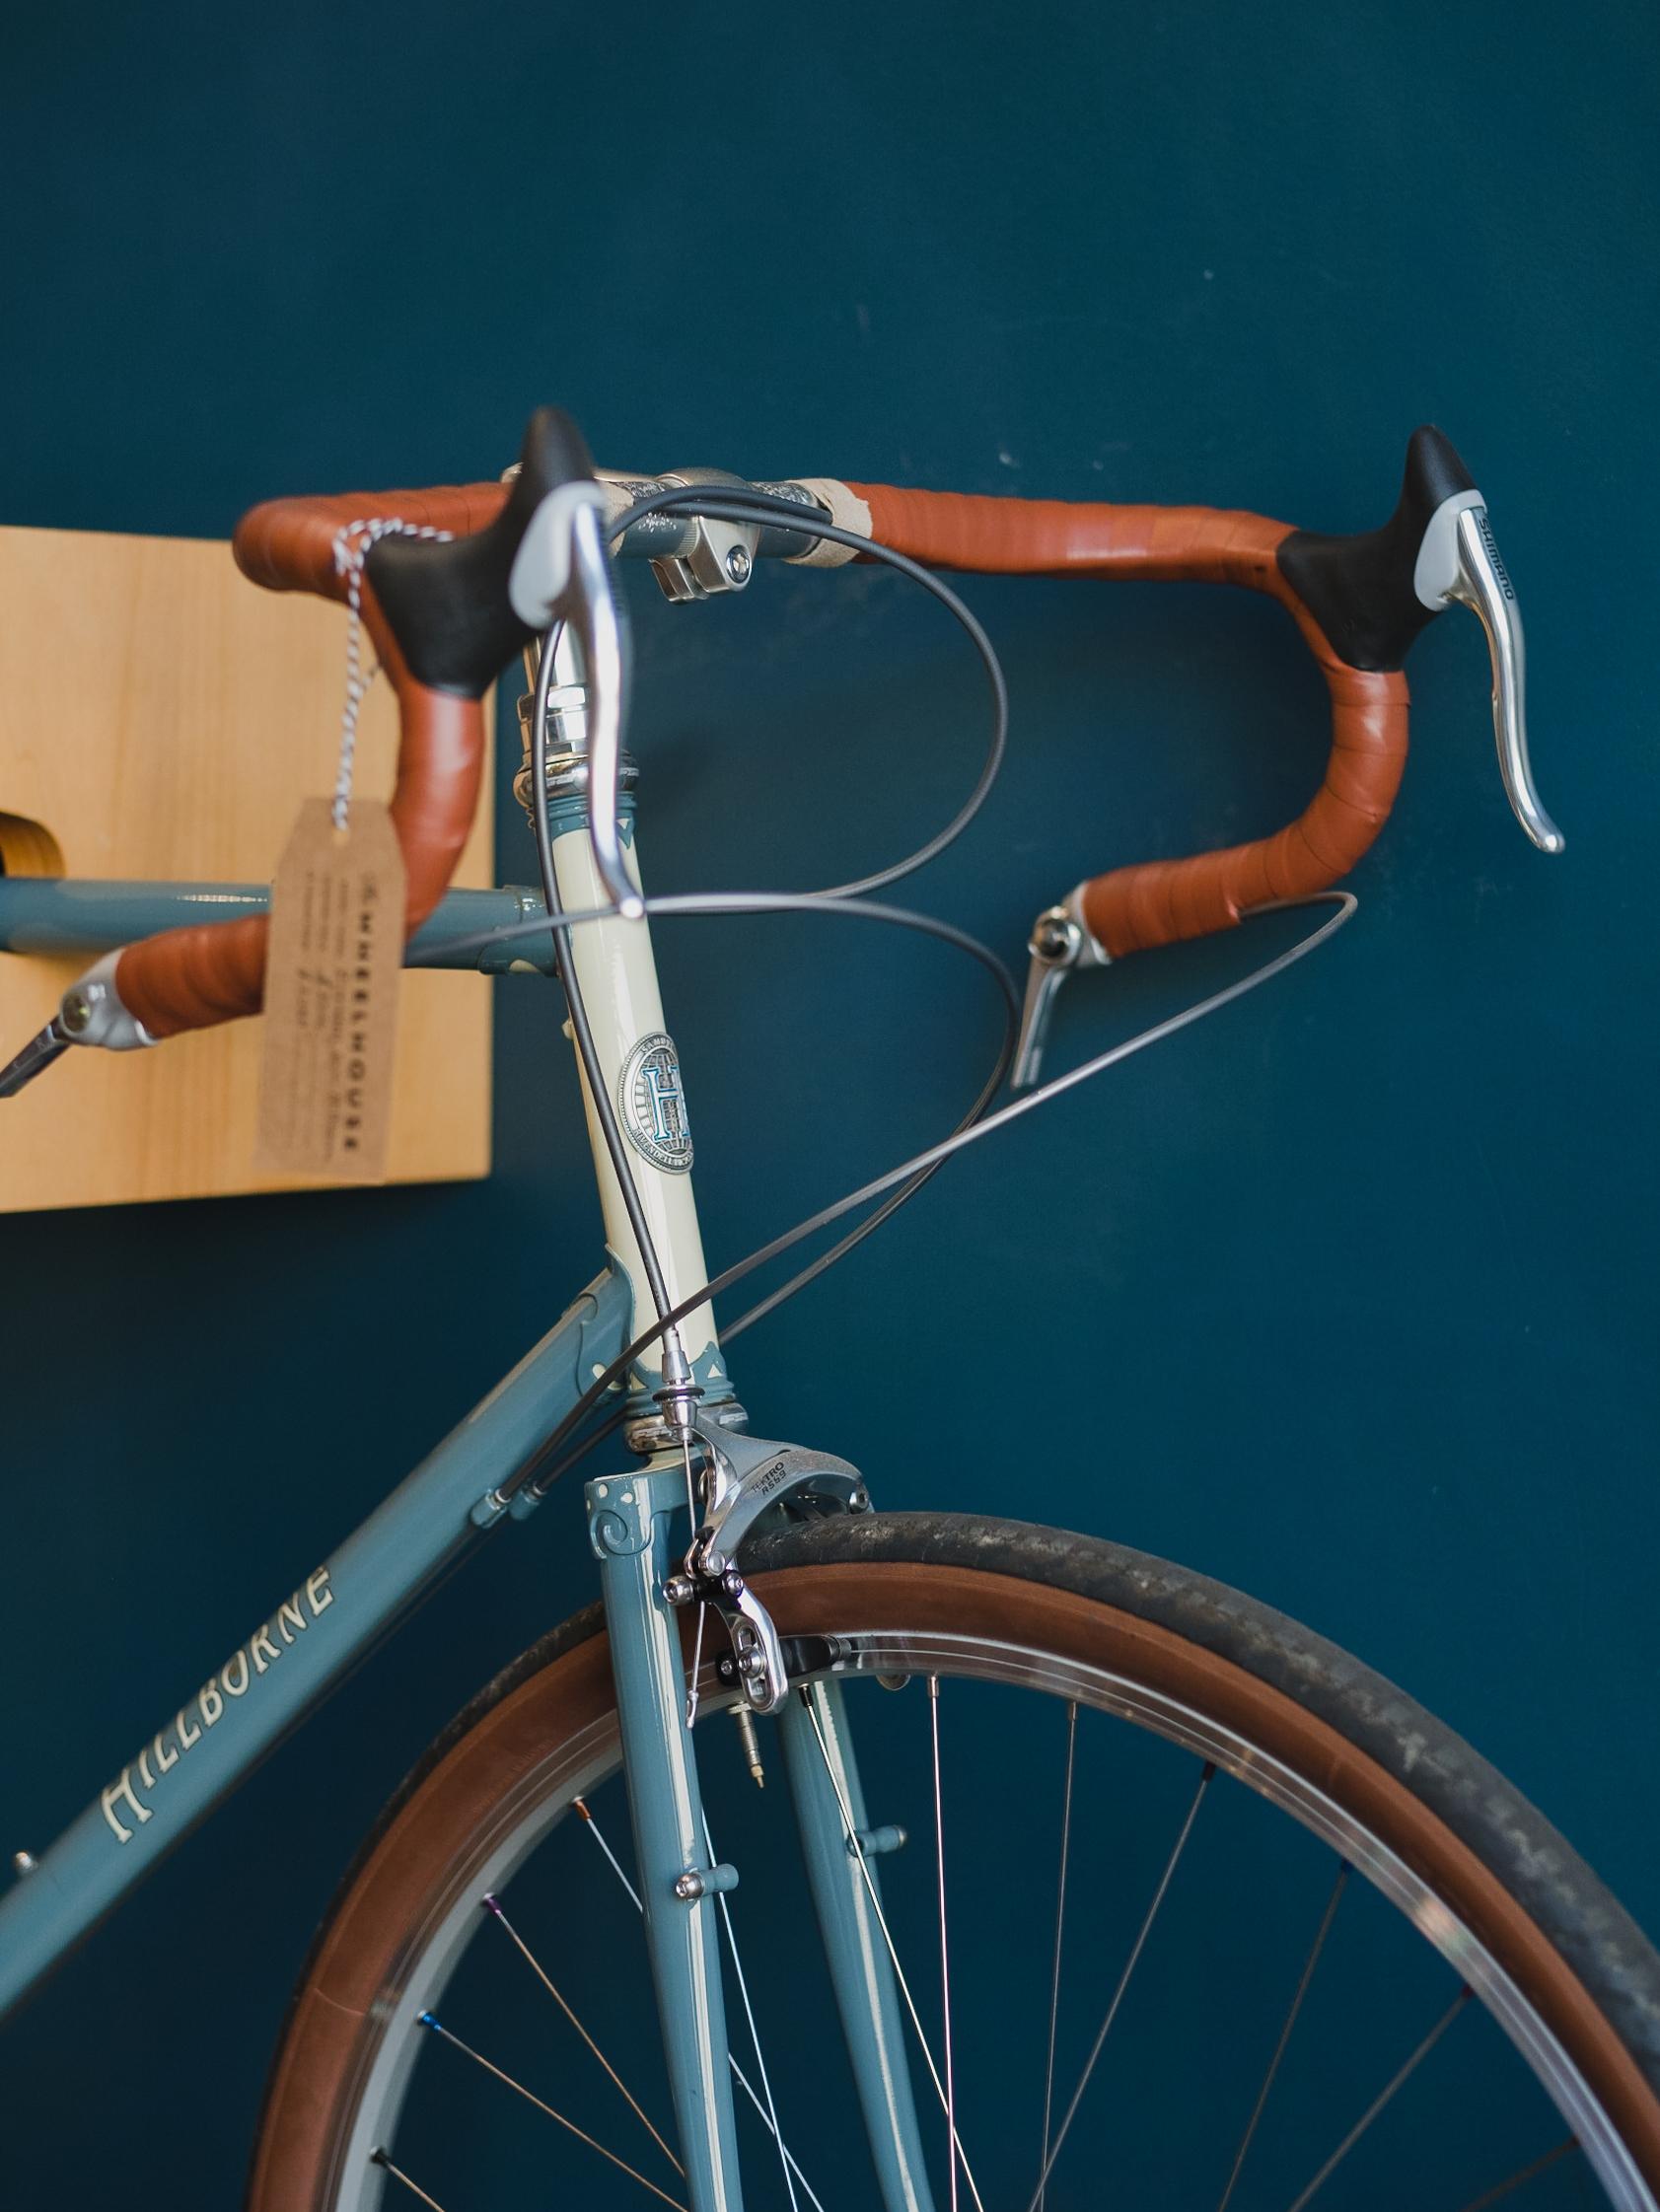 bike-cafe-LA-7944.jpg